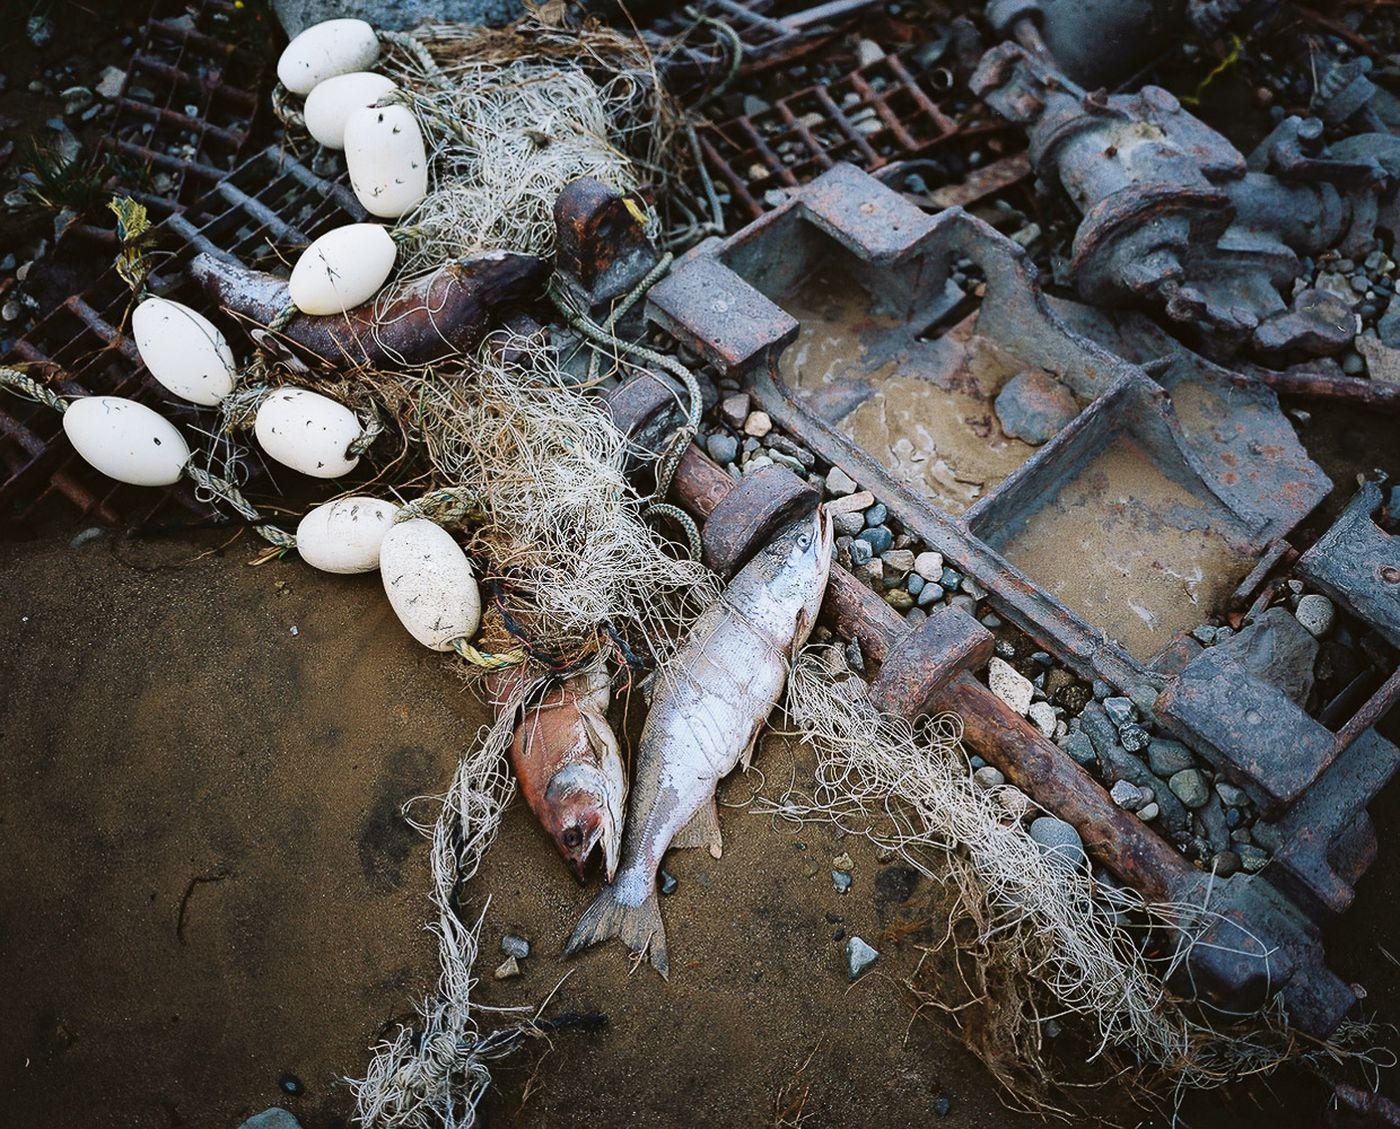 Fish, floats and nets make up a beach still life near Graveyard Point.(Courtesy Corey Arnold)